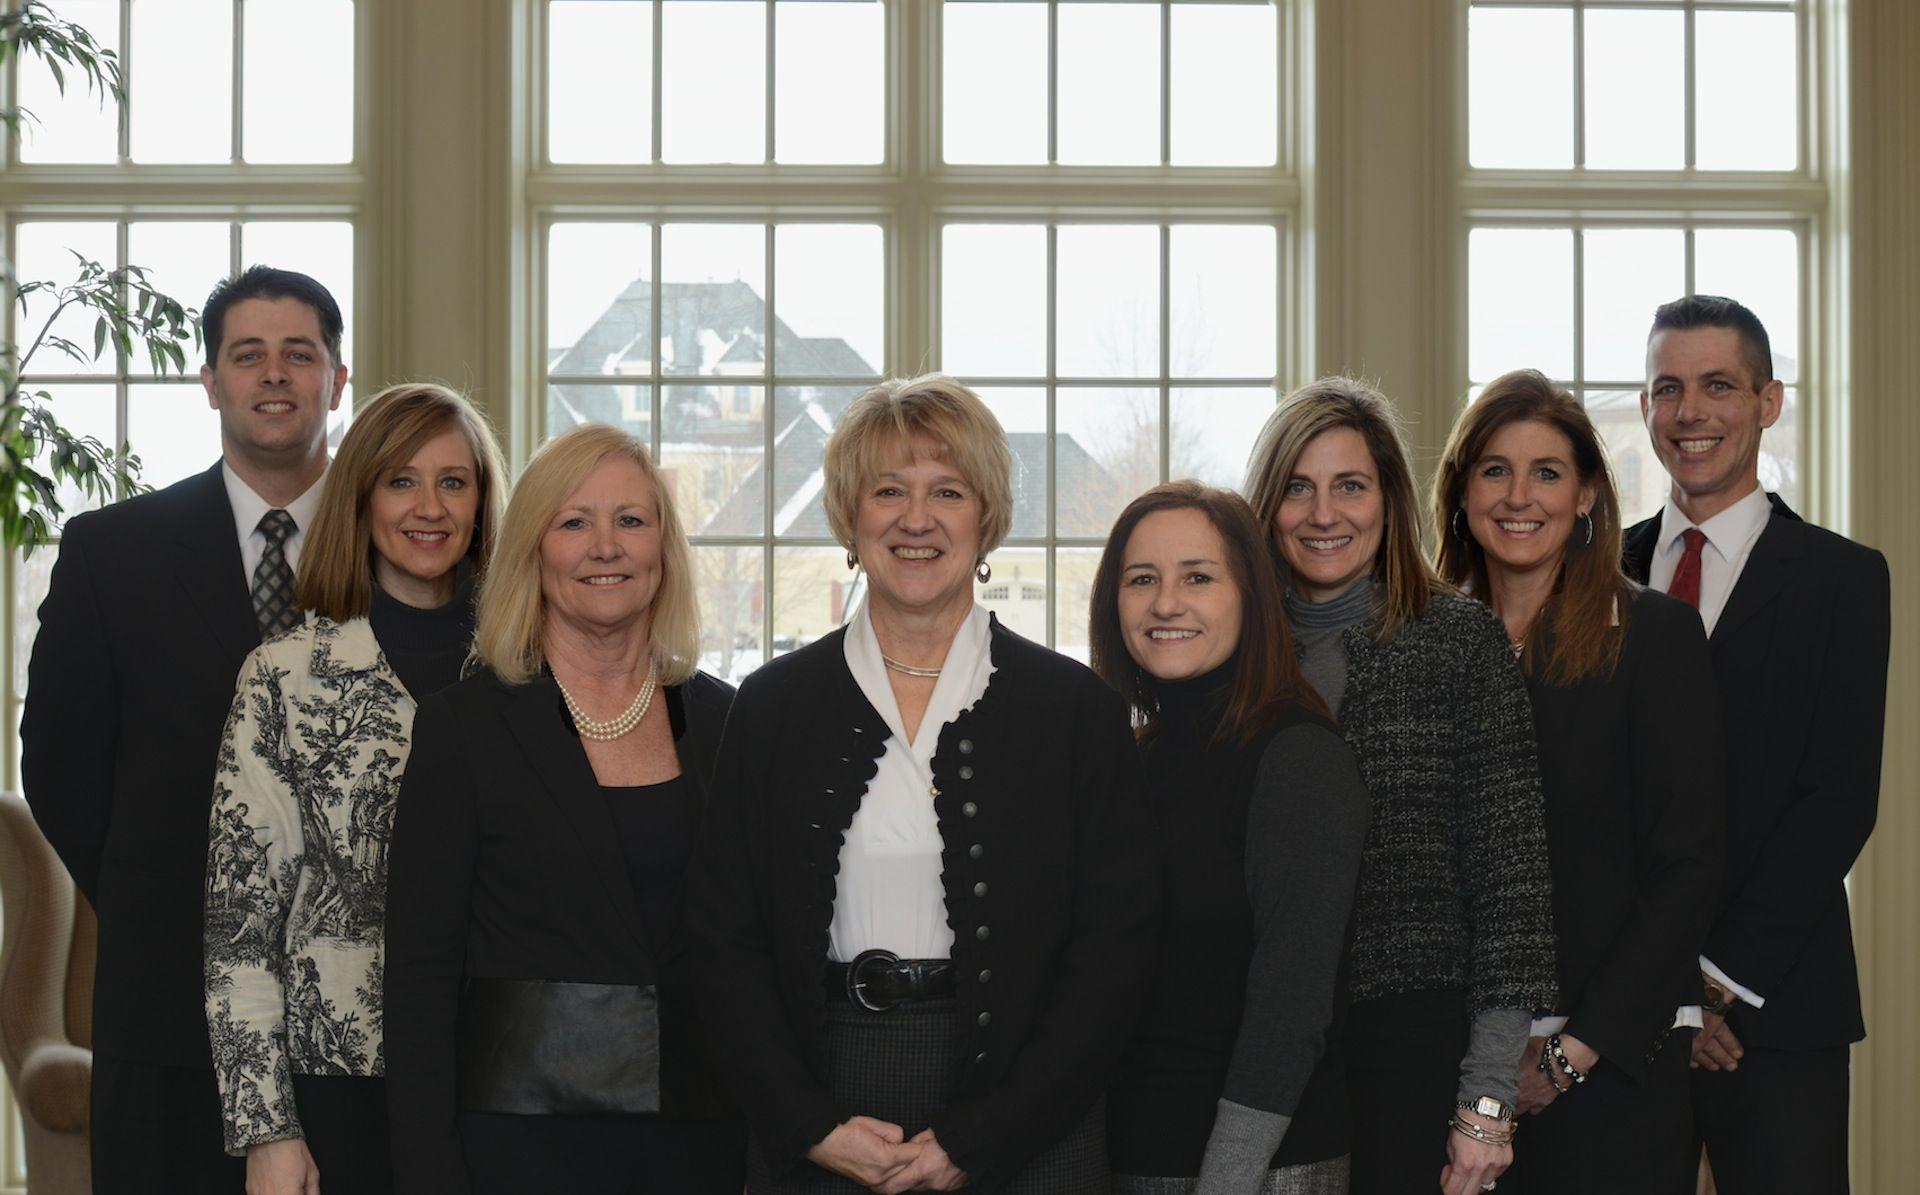 From left: Ben Bond, Michelle Grace, Micki David, Edie Waters, Claudia Miller, Christine McCarthy, Stephanie Snowden, Marcus McIntire